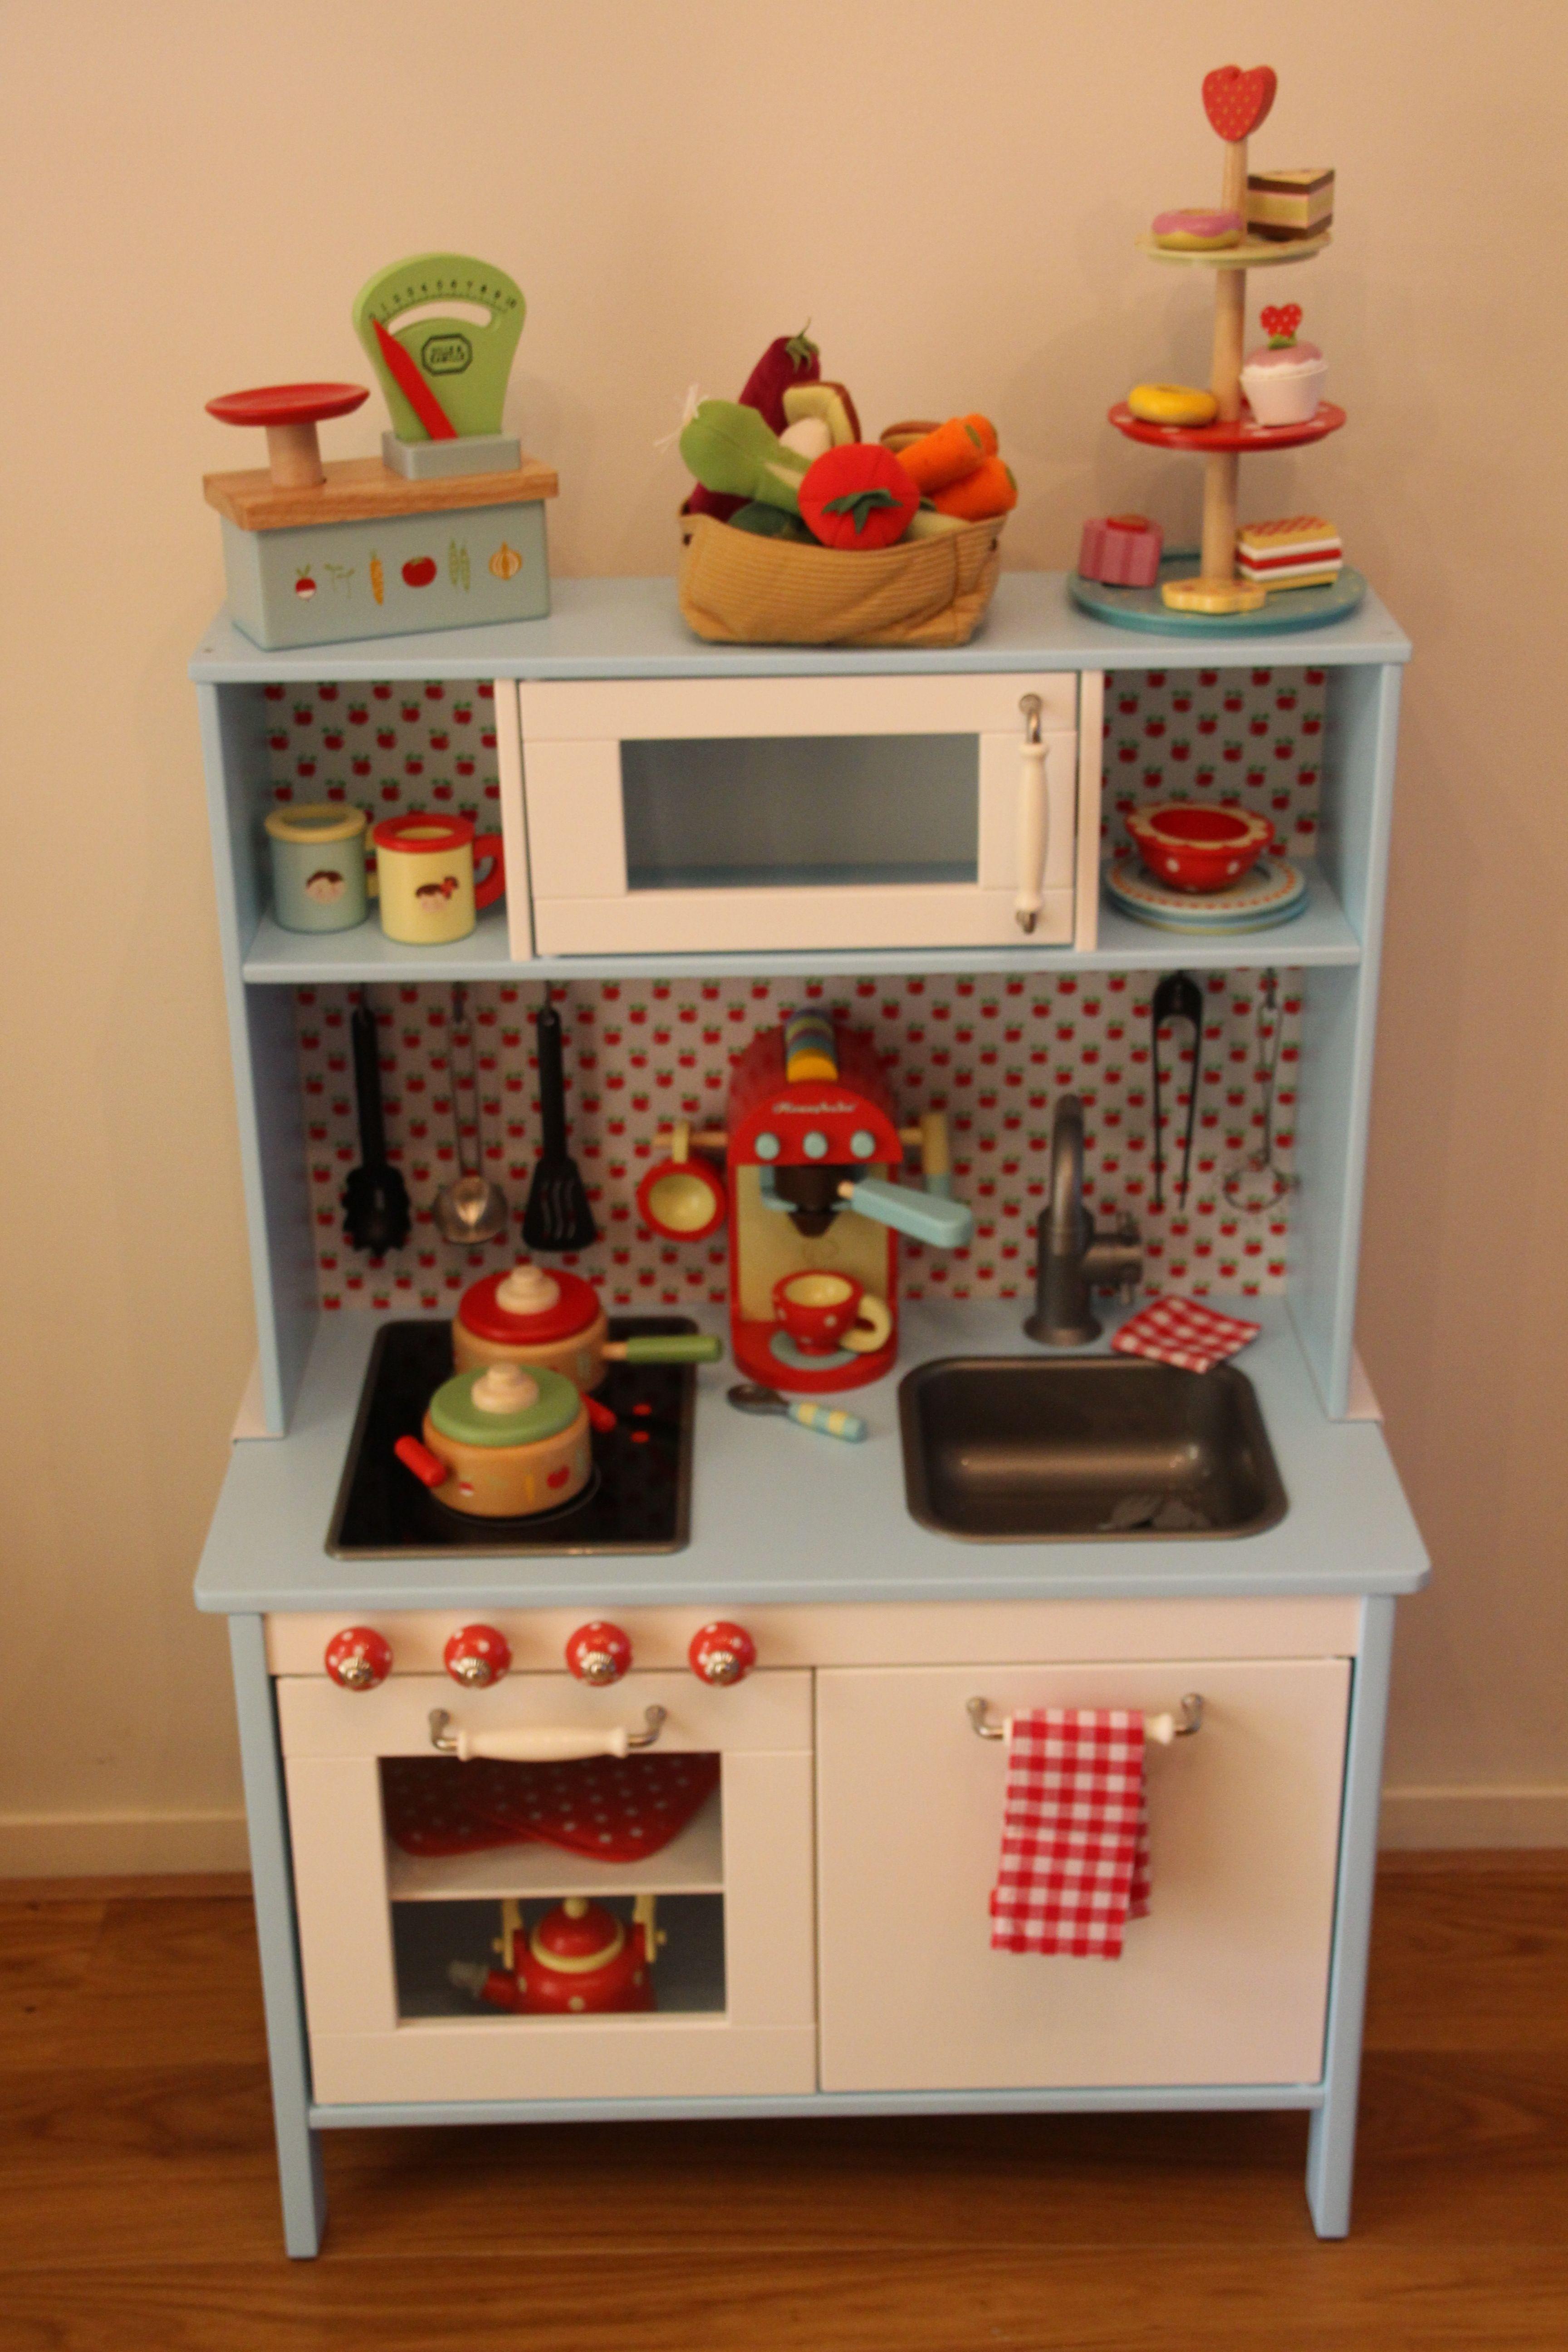 Trapito cocina ikea hacks pinterest trapillo cocina for Cocina juguete ikea opiniones